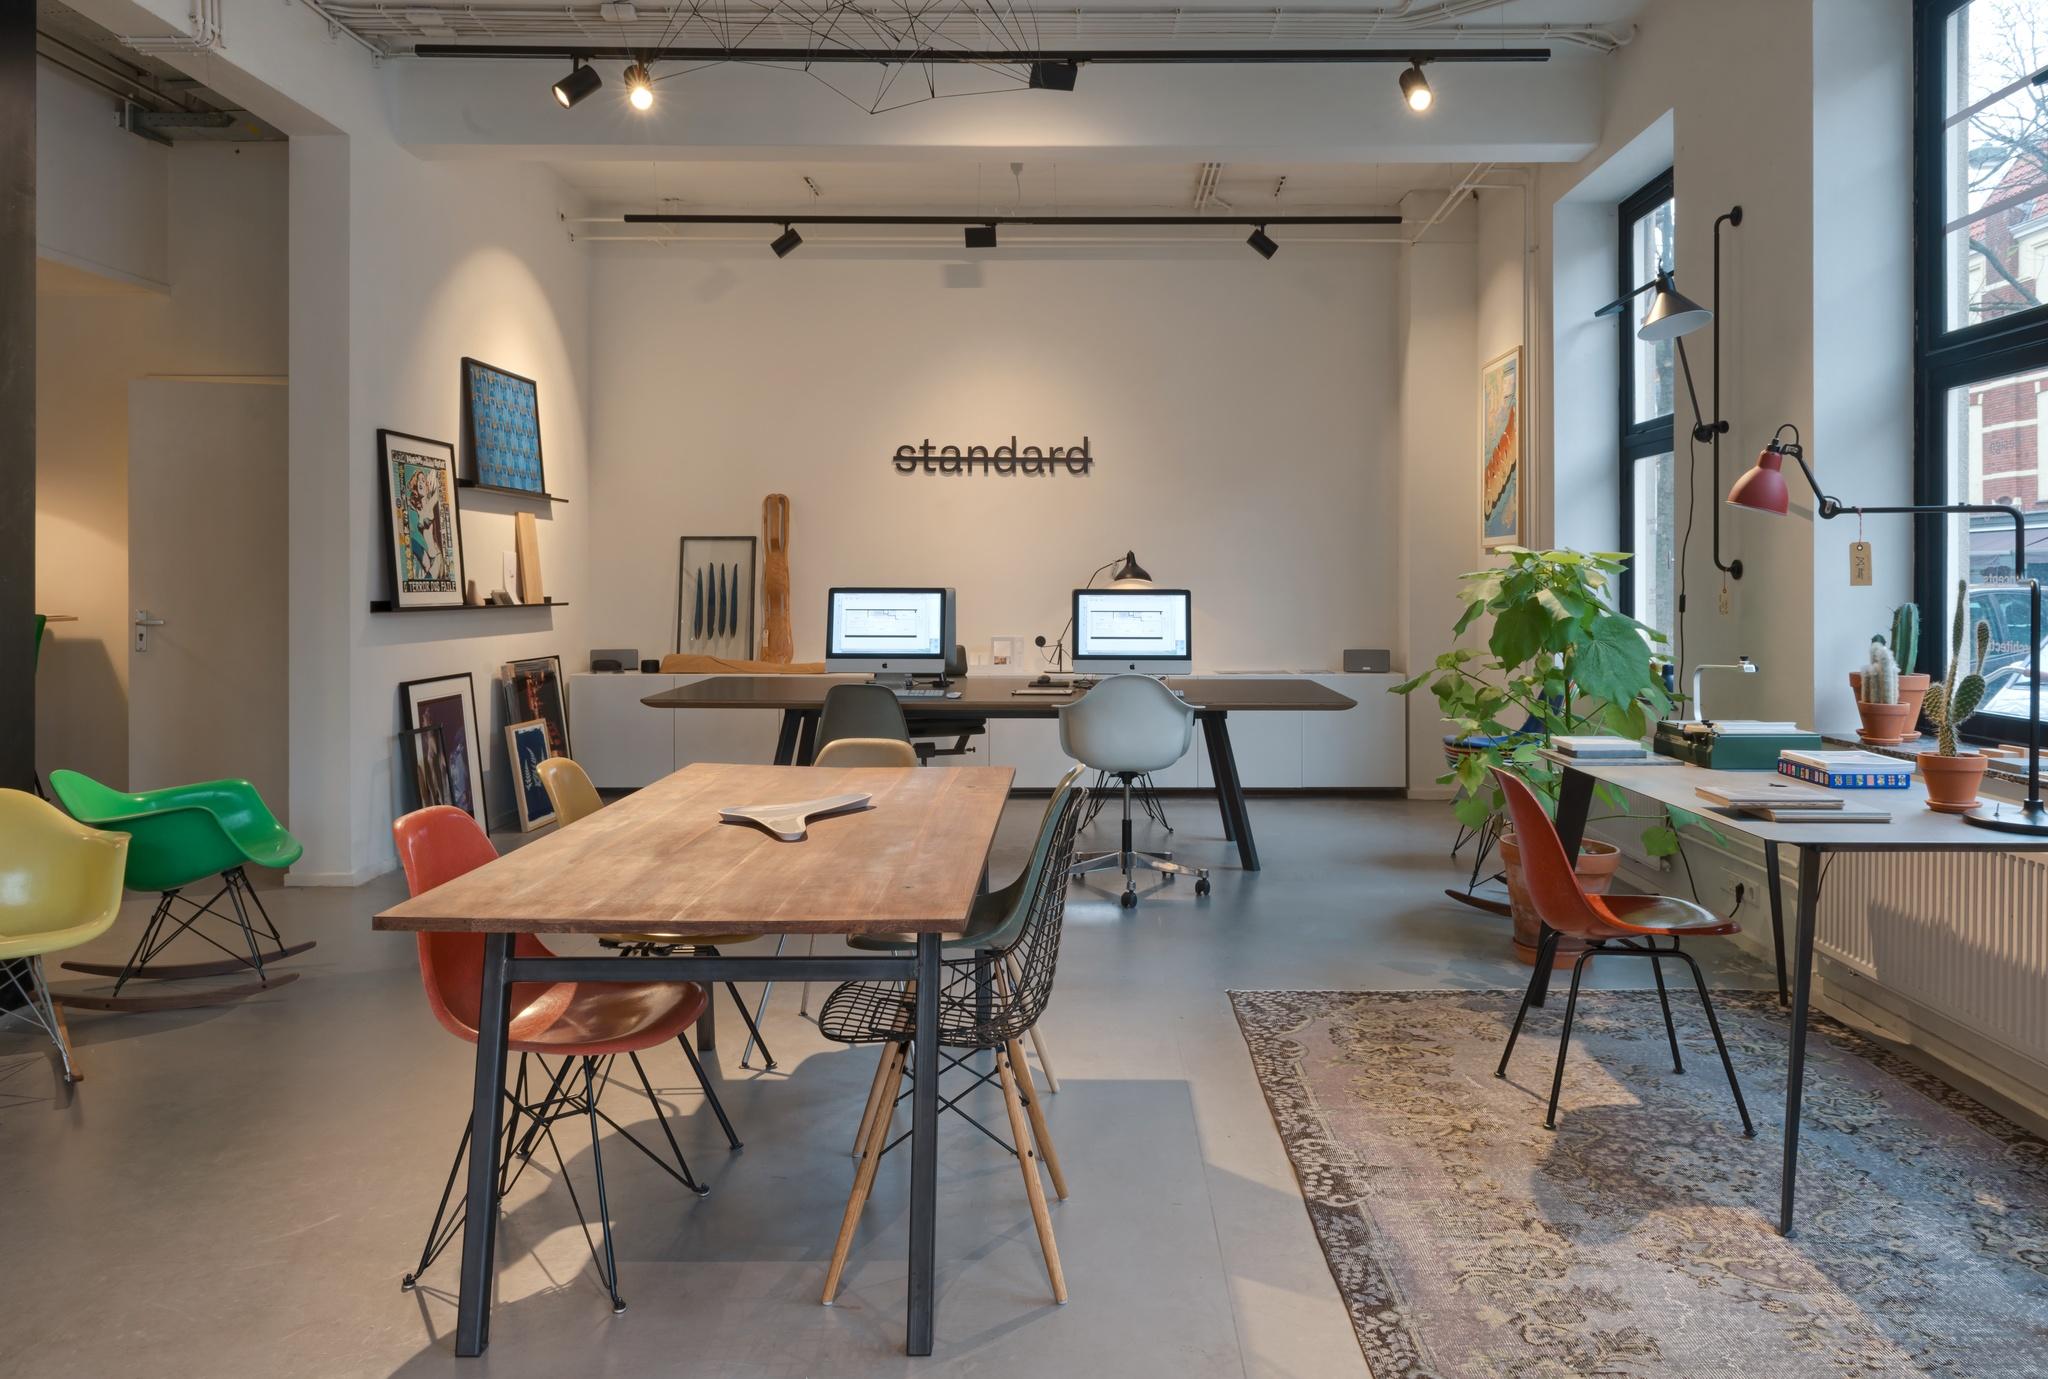 tranquilo-modern-vintage-standard-amsterdam-chairs